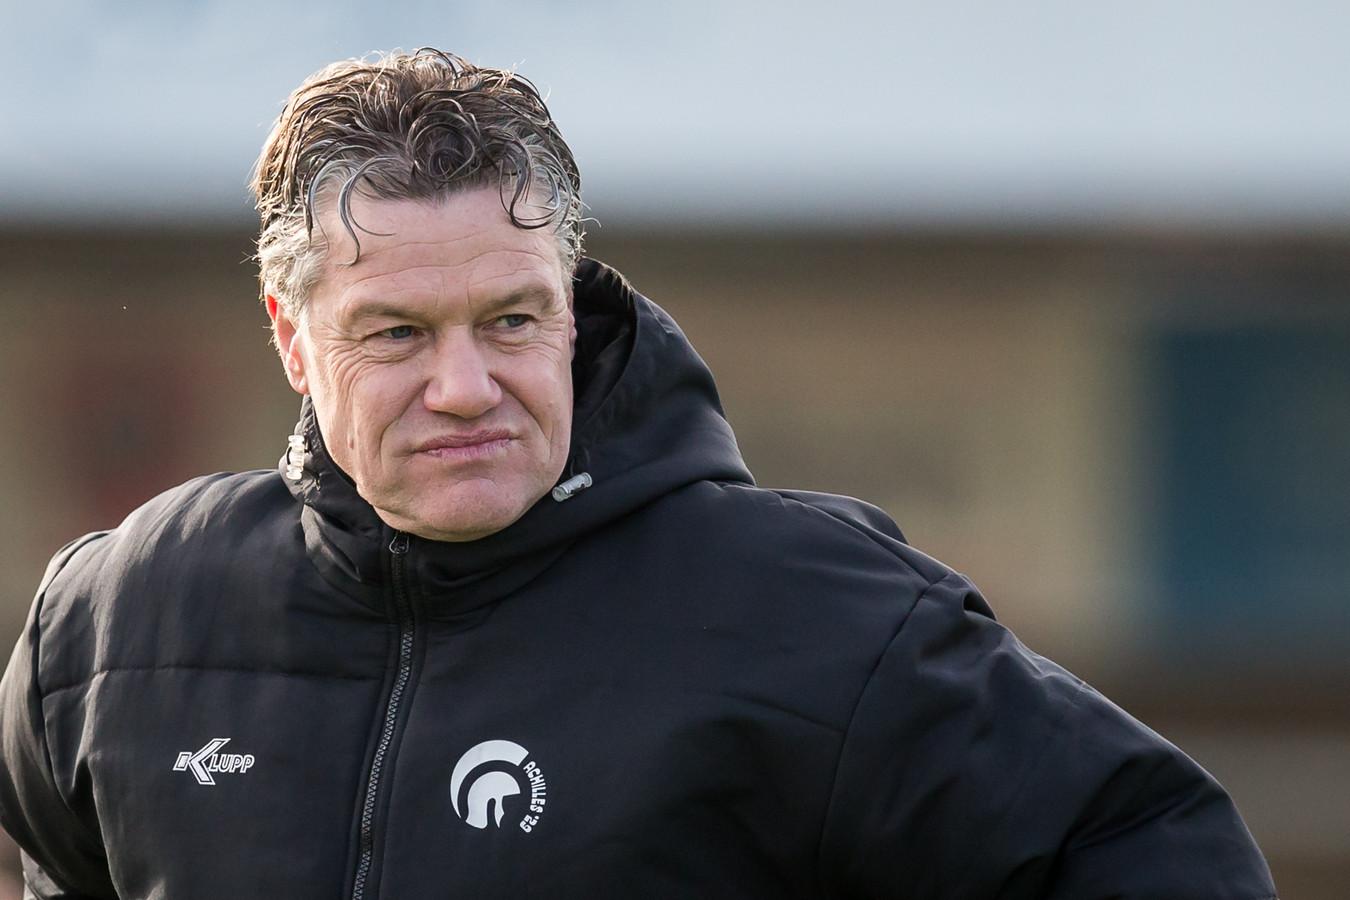 Arno Arts trekt een zuur gezicht als trainer van Achilles'29 afgelopen seizoen.